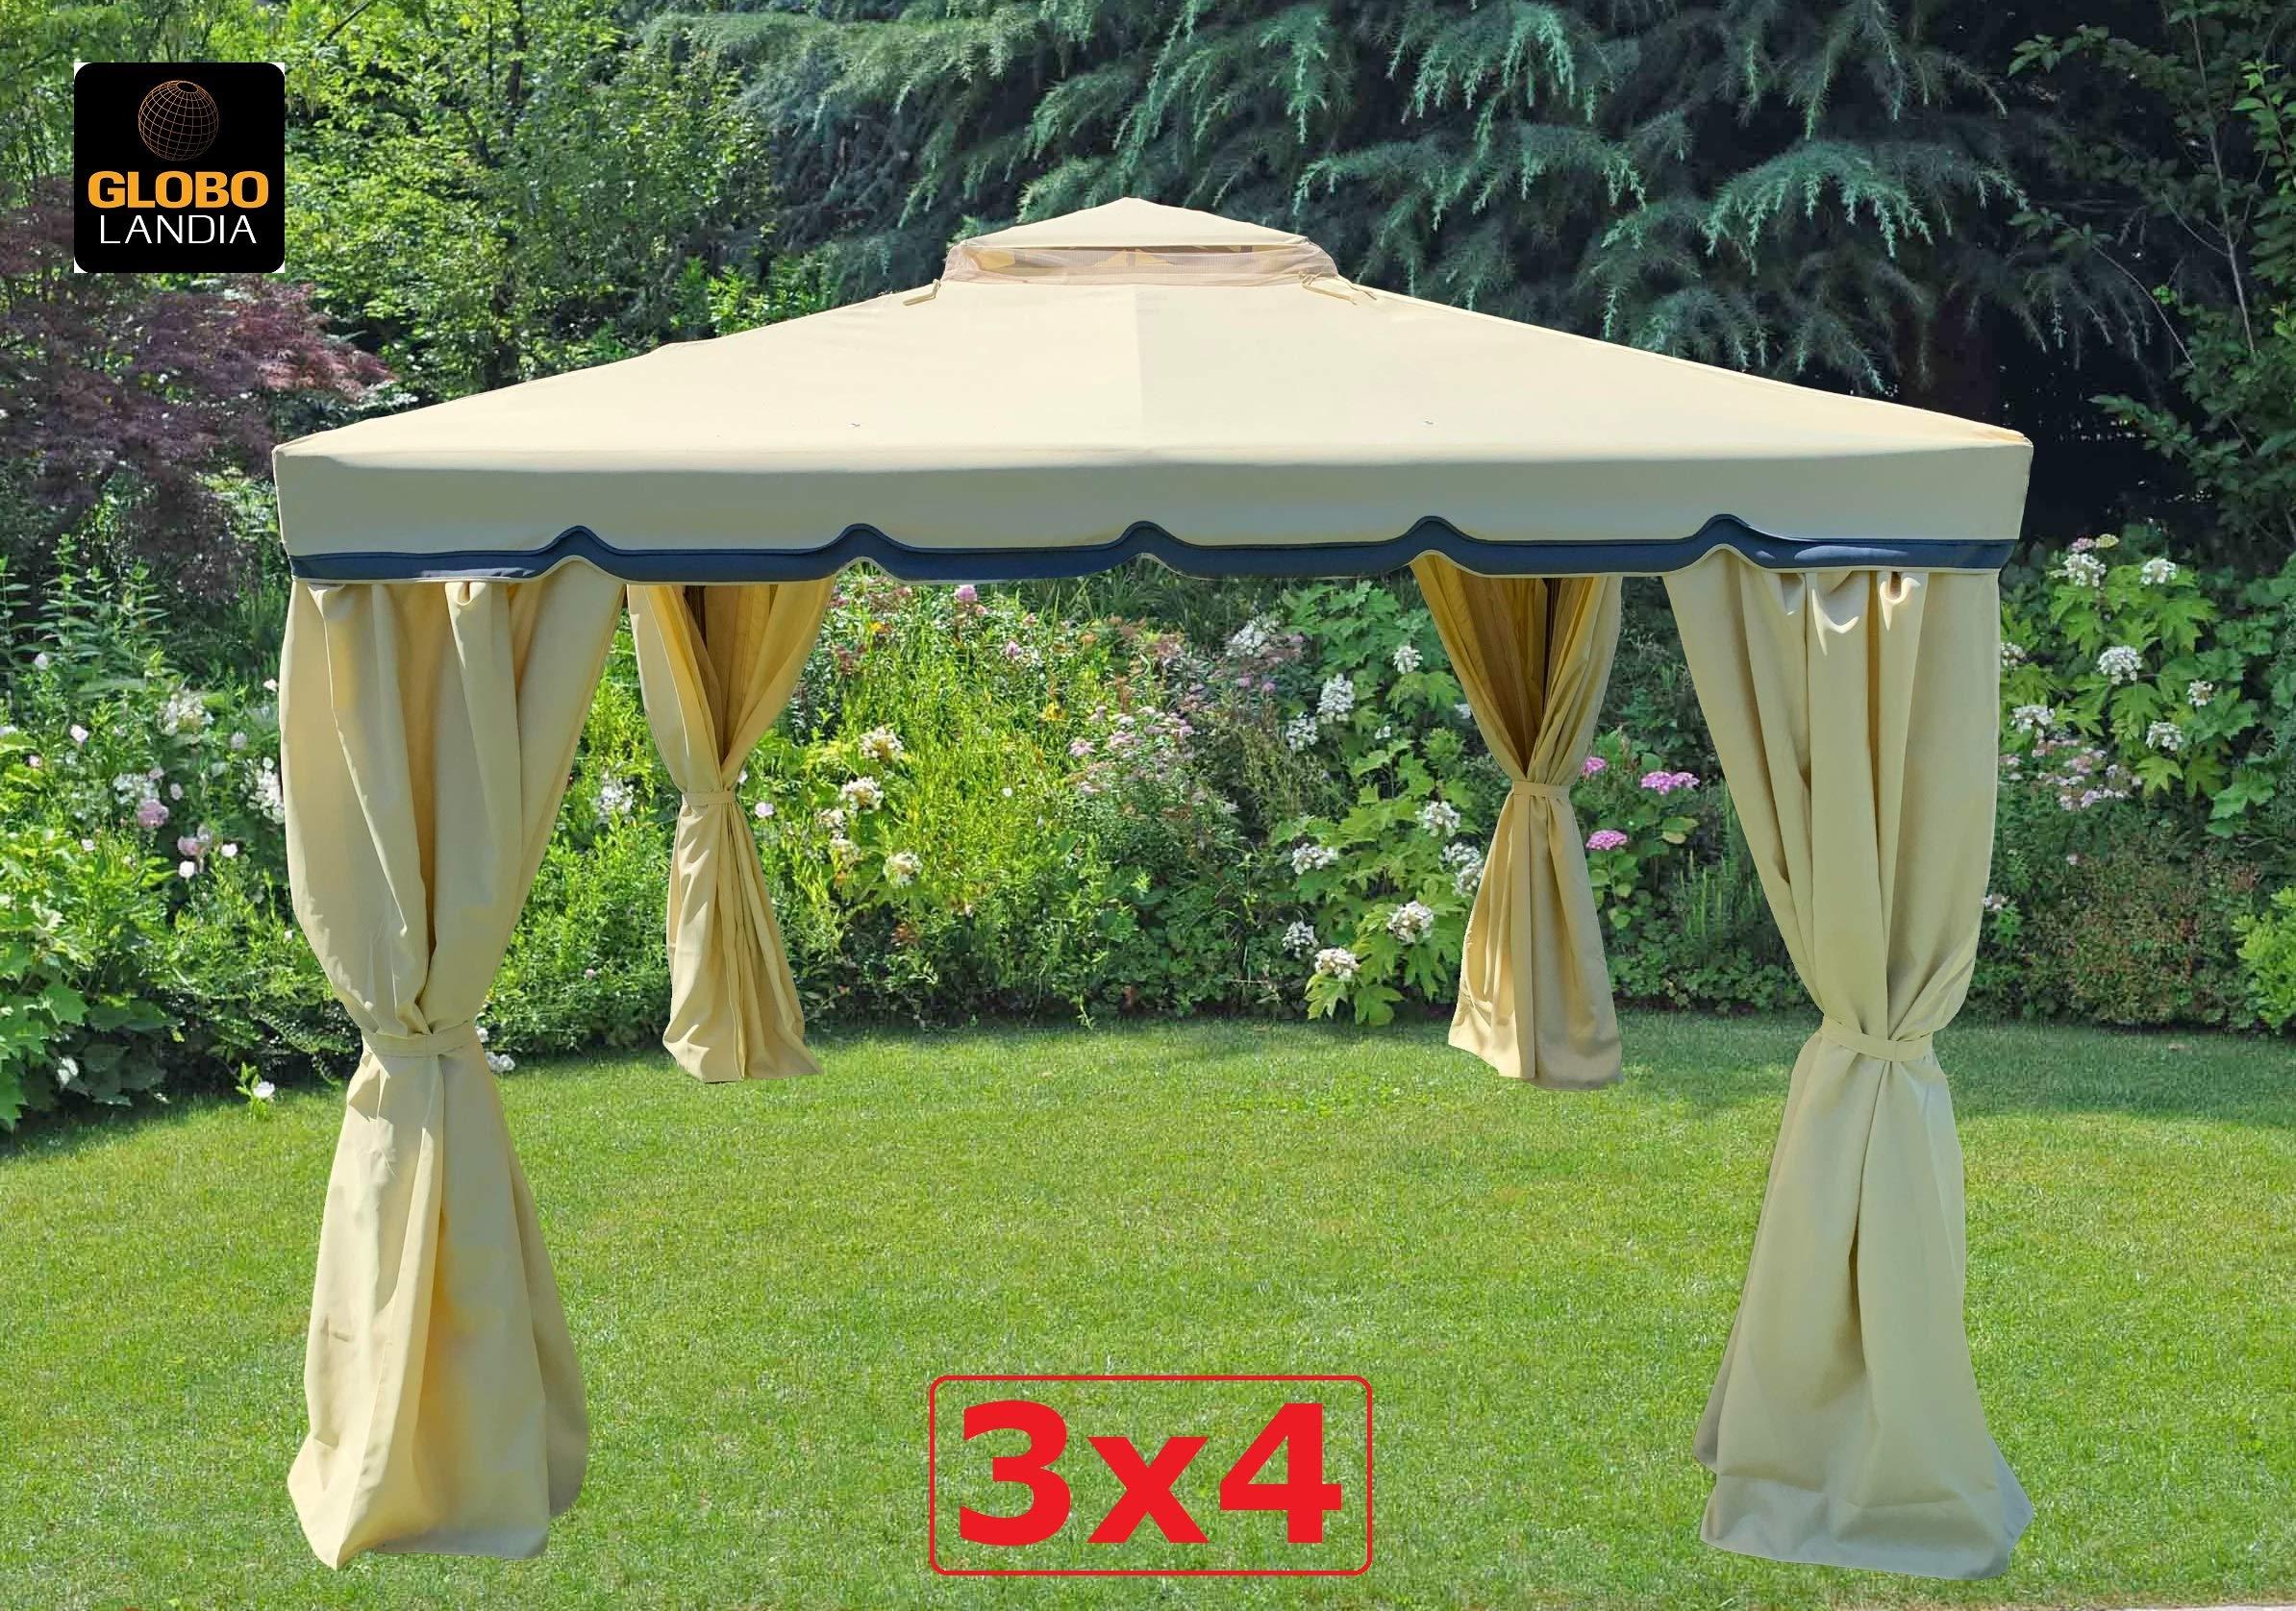 Eurolandia s.r.l. - Cenador de jardín - Modelo 676165 - Medidas 3 x 4 mt - Estructura de aluminio - Techo de PVC (policloruro de vinilo) de 400 gr - Impermeable - Mosquiteras laterales: Amazon.es: Hogar